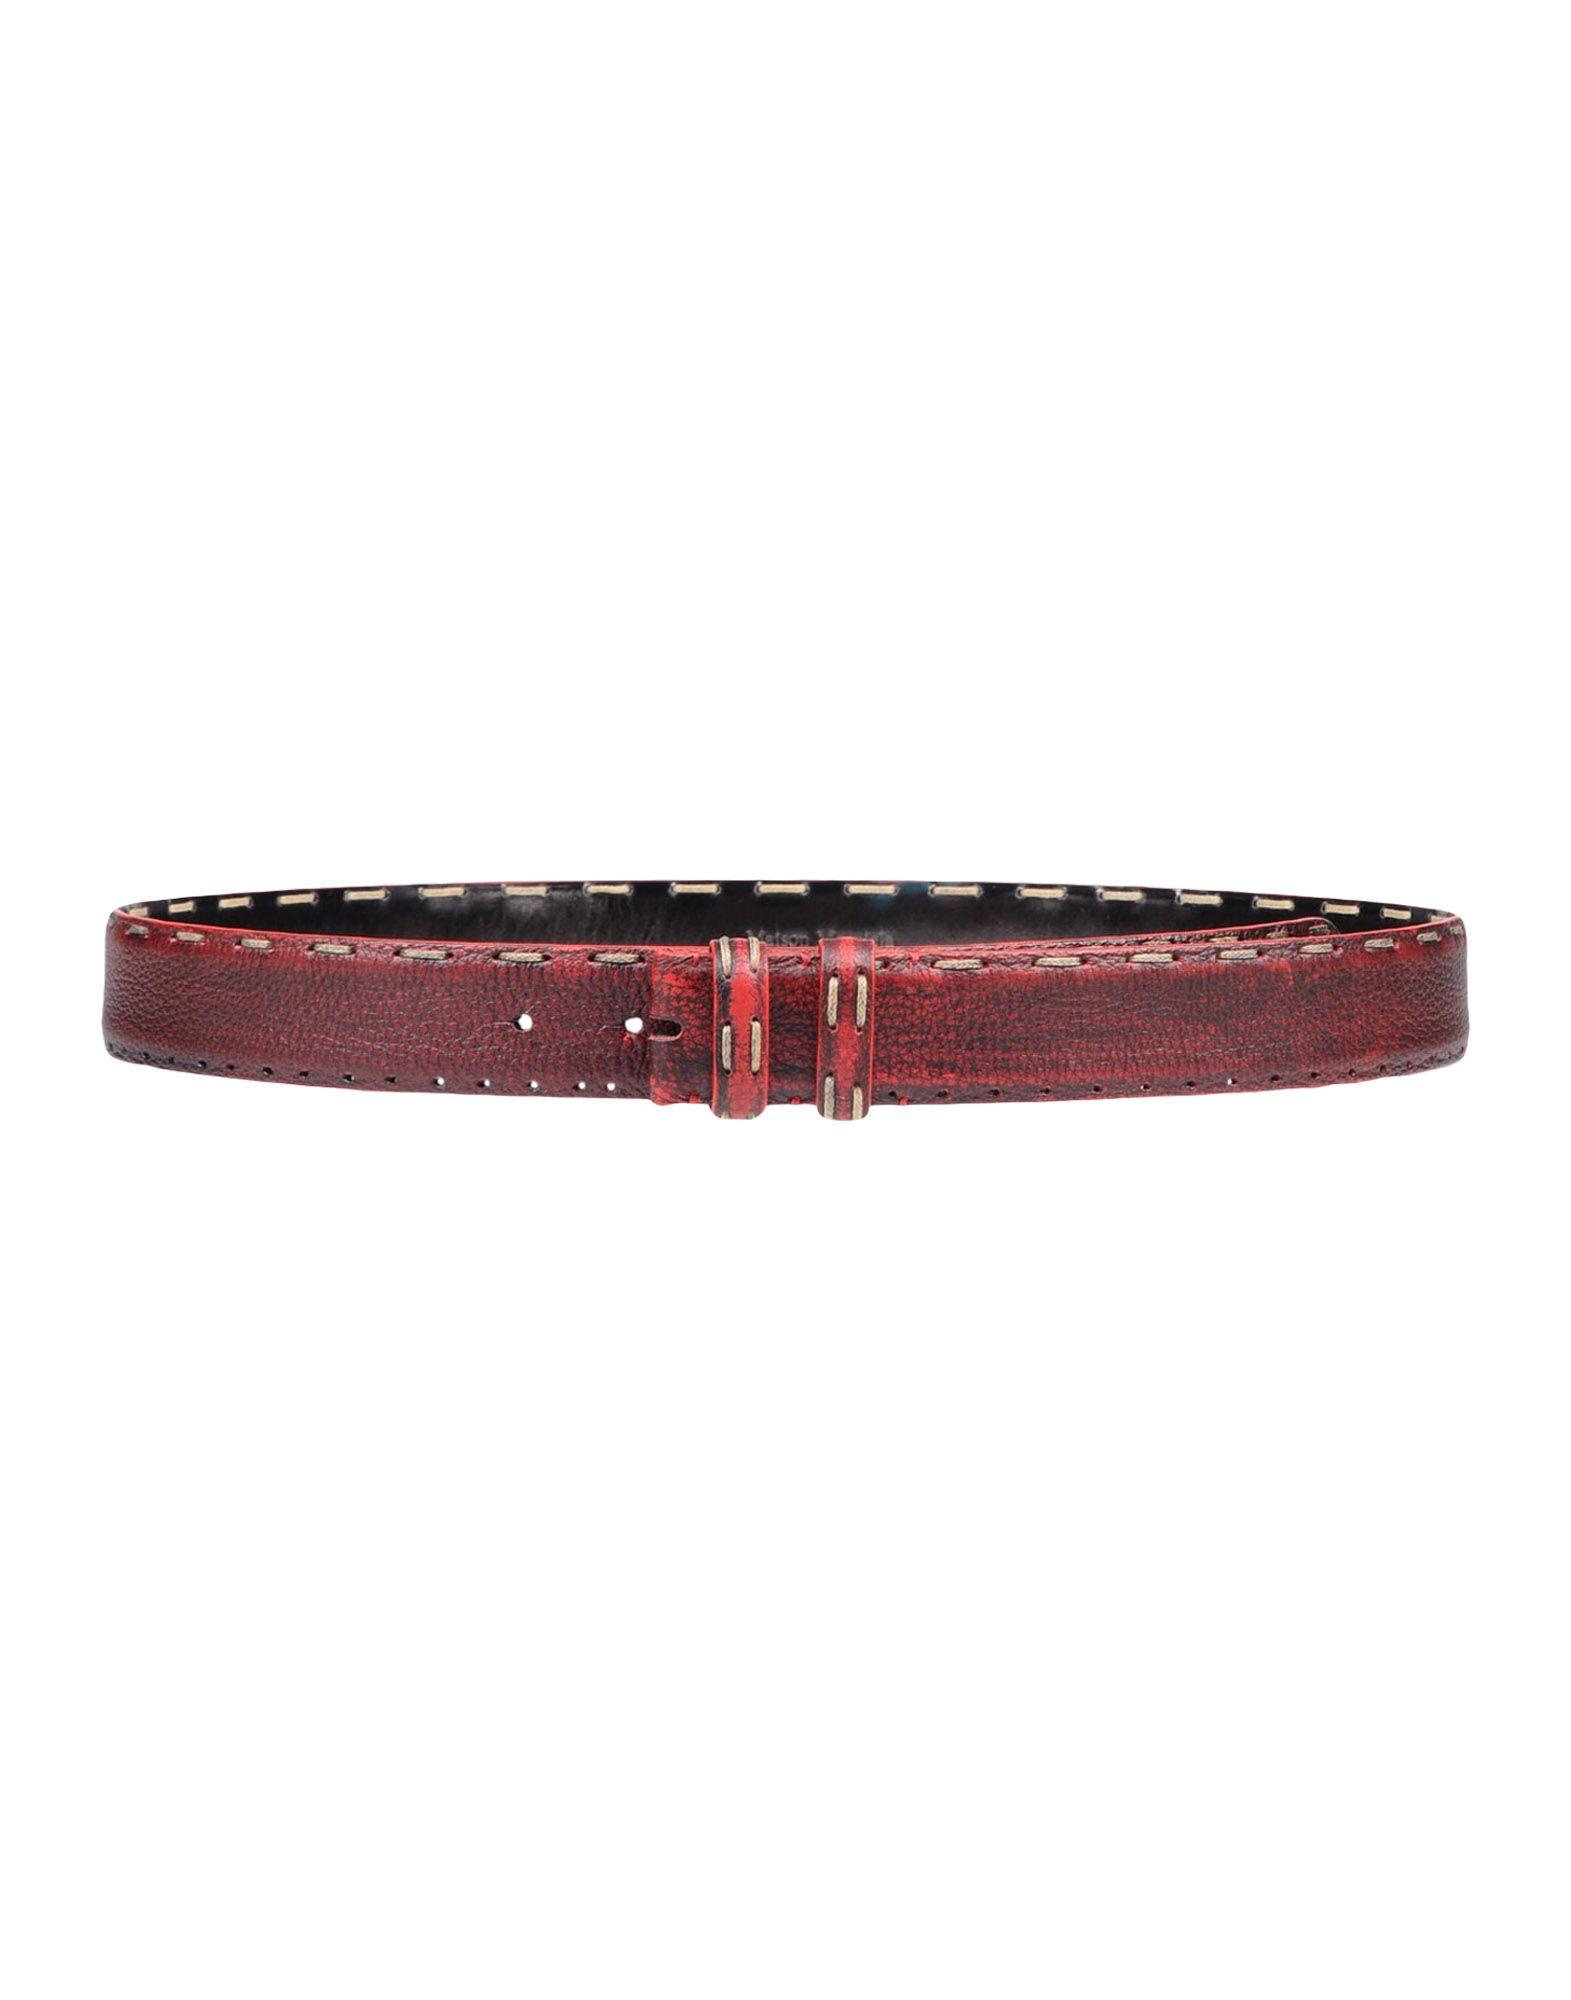 Cintura In Pelle Maison Margiela Donna - Acquista online su